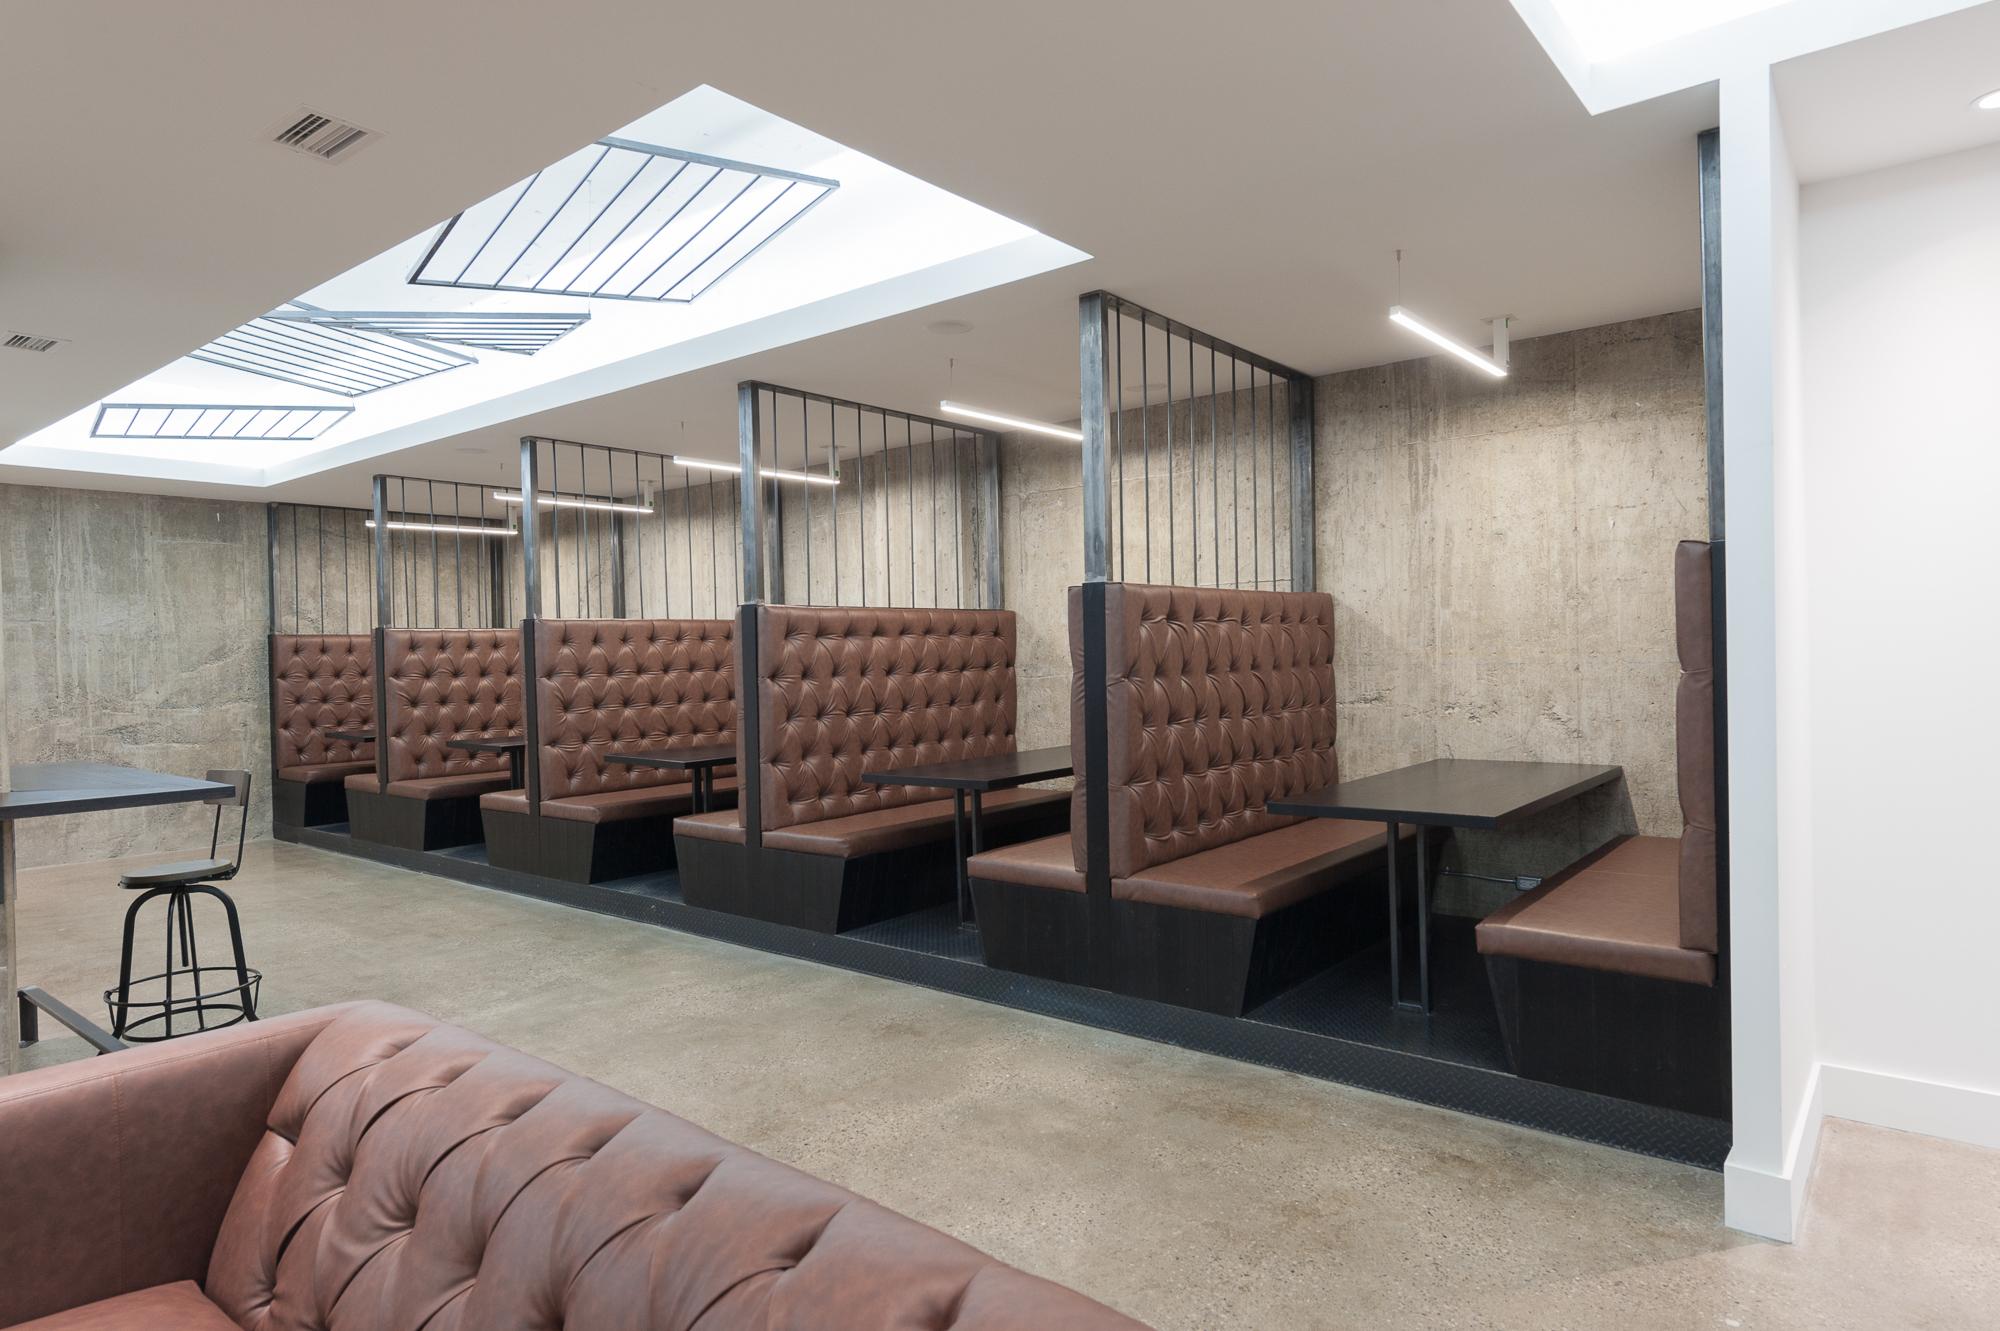 250university vault seating